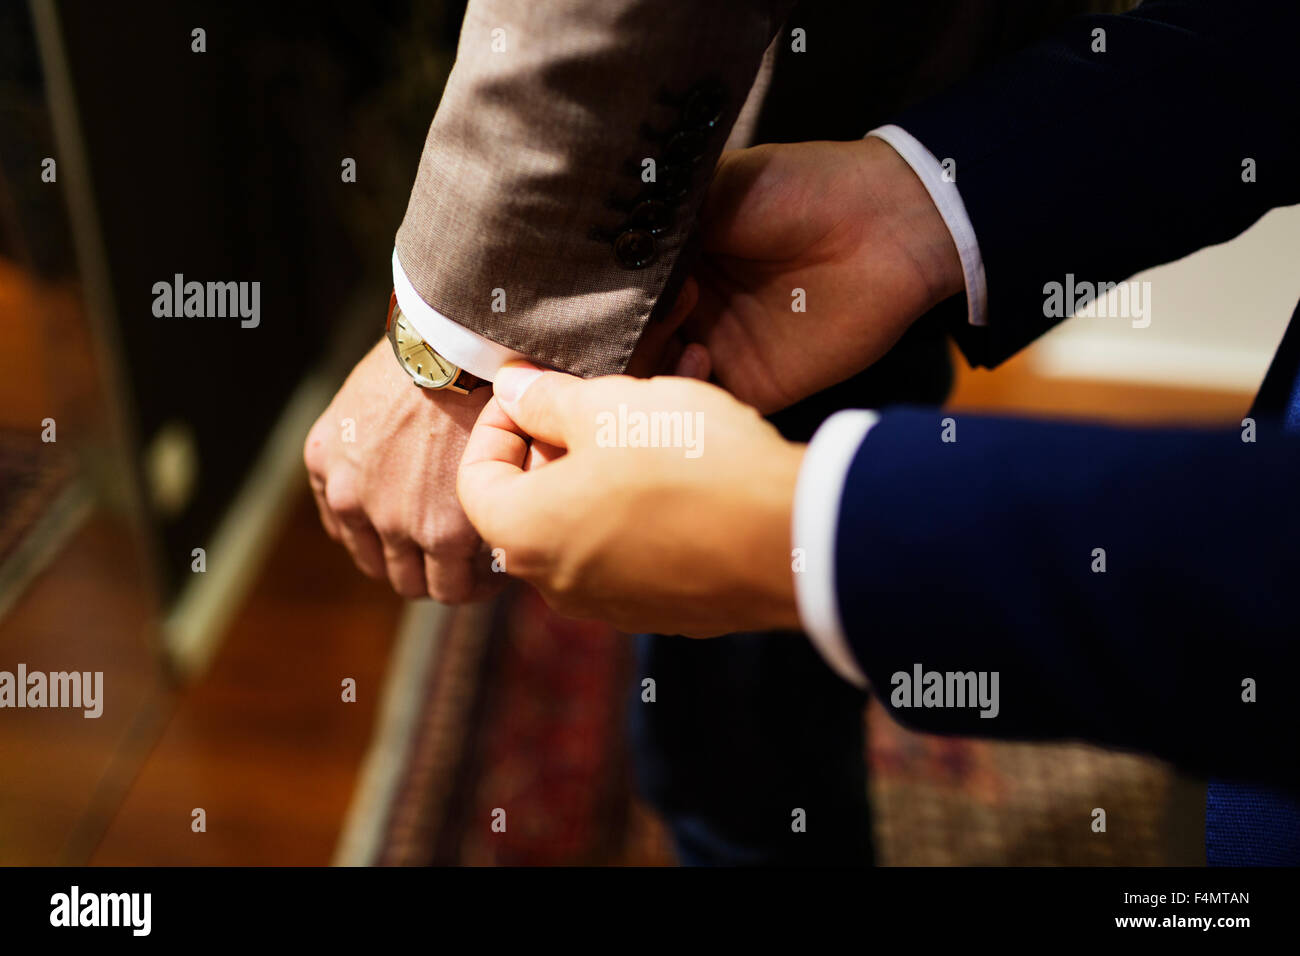 Cropped hands of sales clerk adjusting customer's sleeve in clothing store - Stock Image